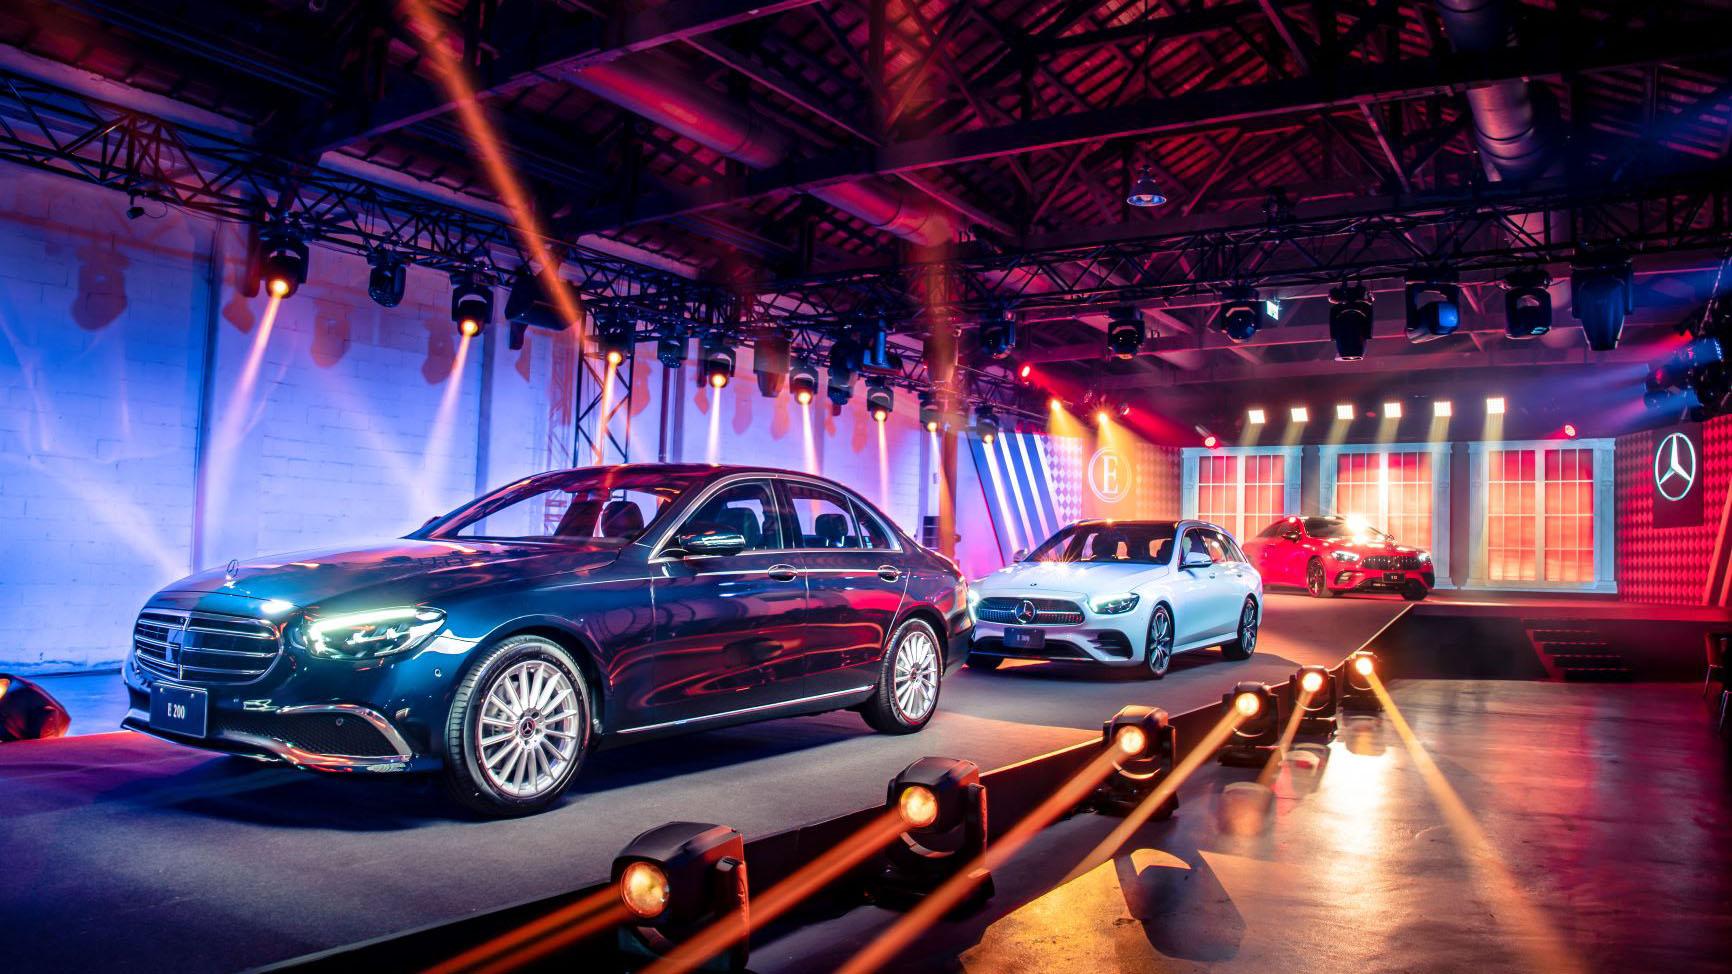 Mercedes-Benz 蟬聯「2020 年全球最有價值豪華汽車品牌」